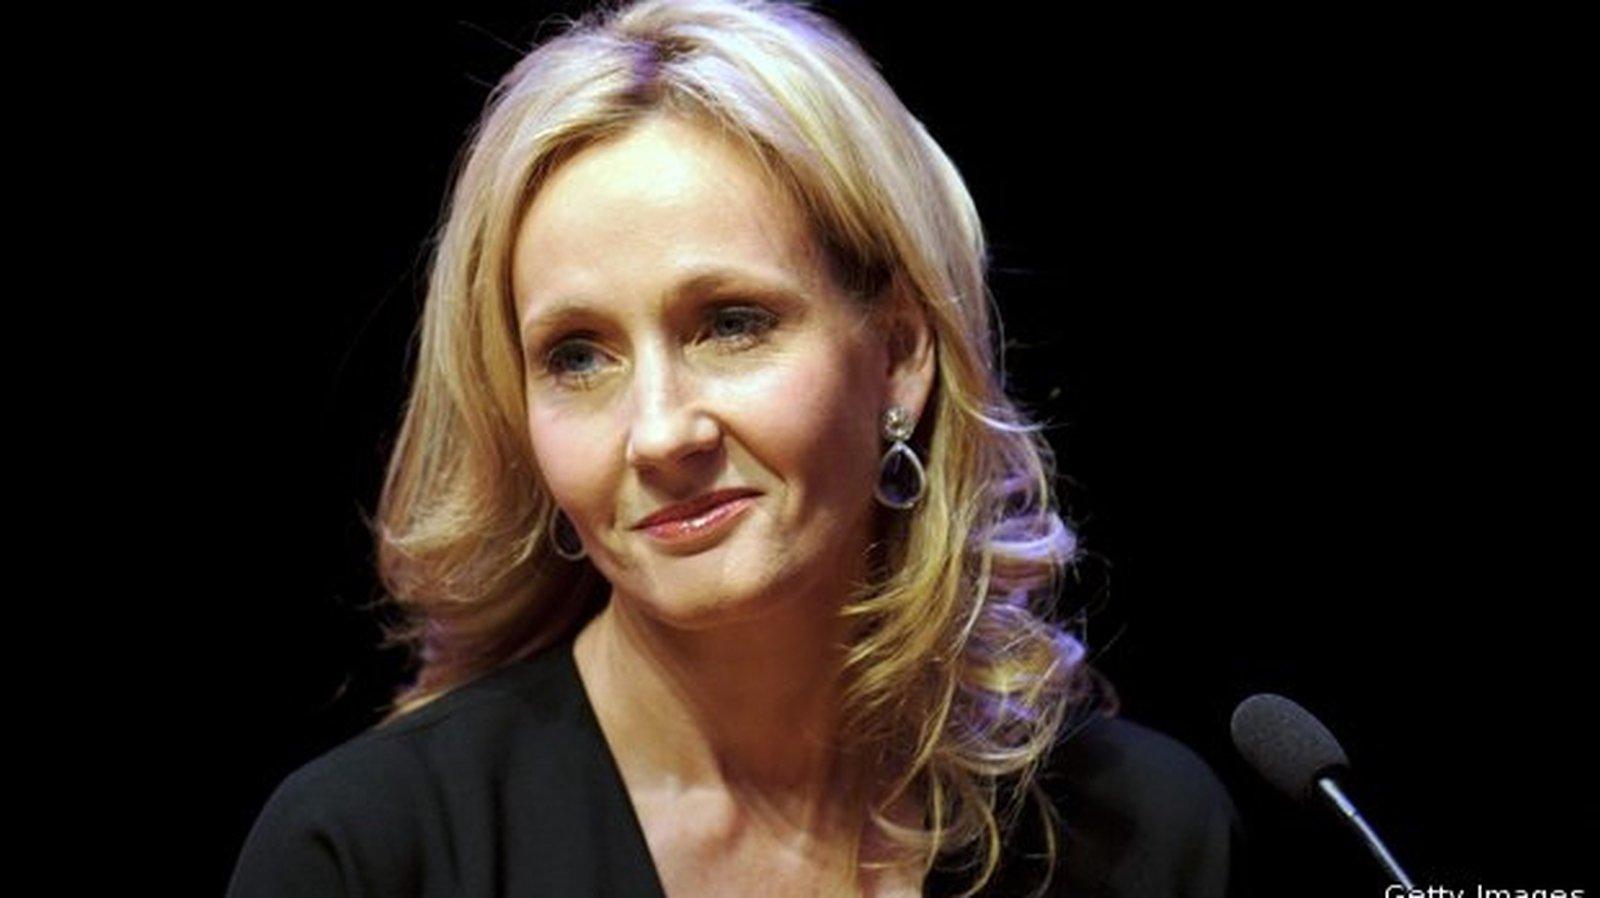 Complaint over JK Rowling 'transphobic' comment upheld thumbnail